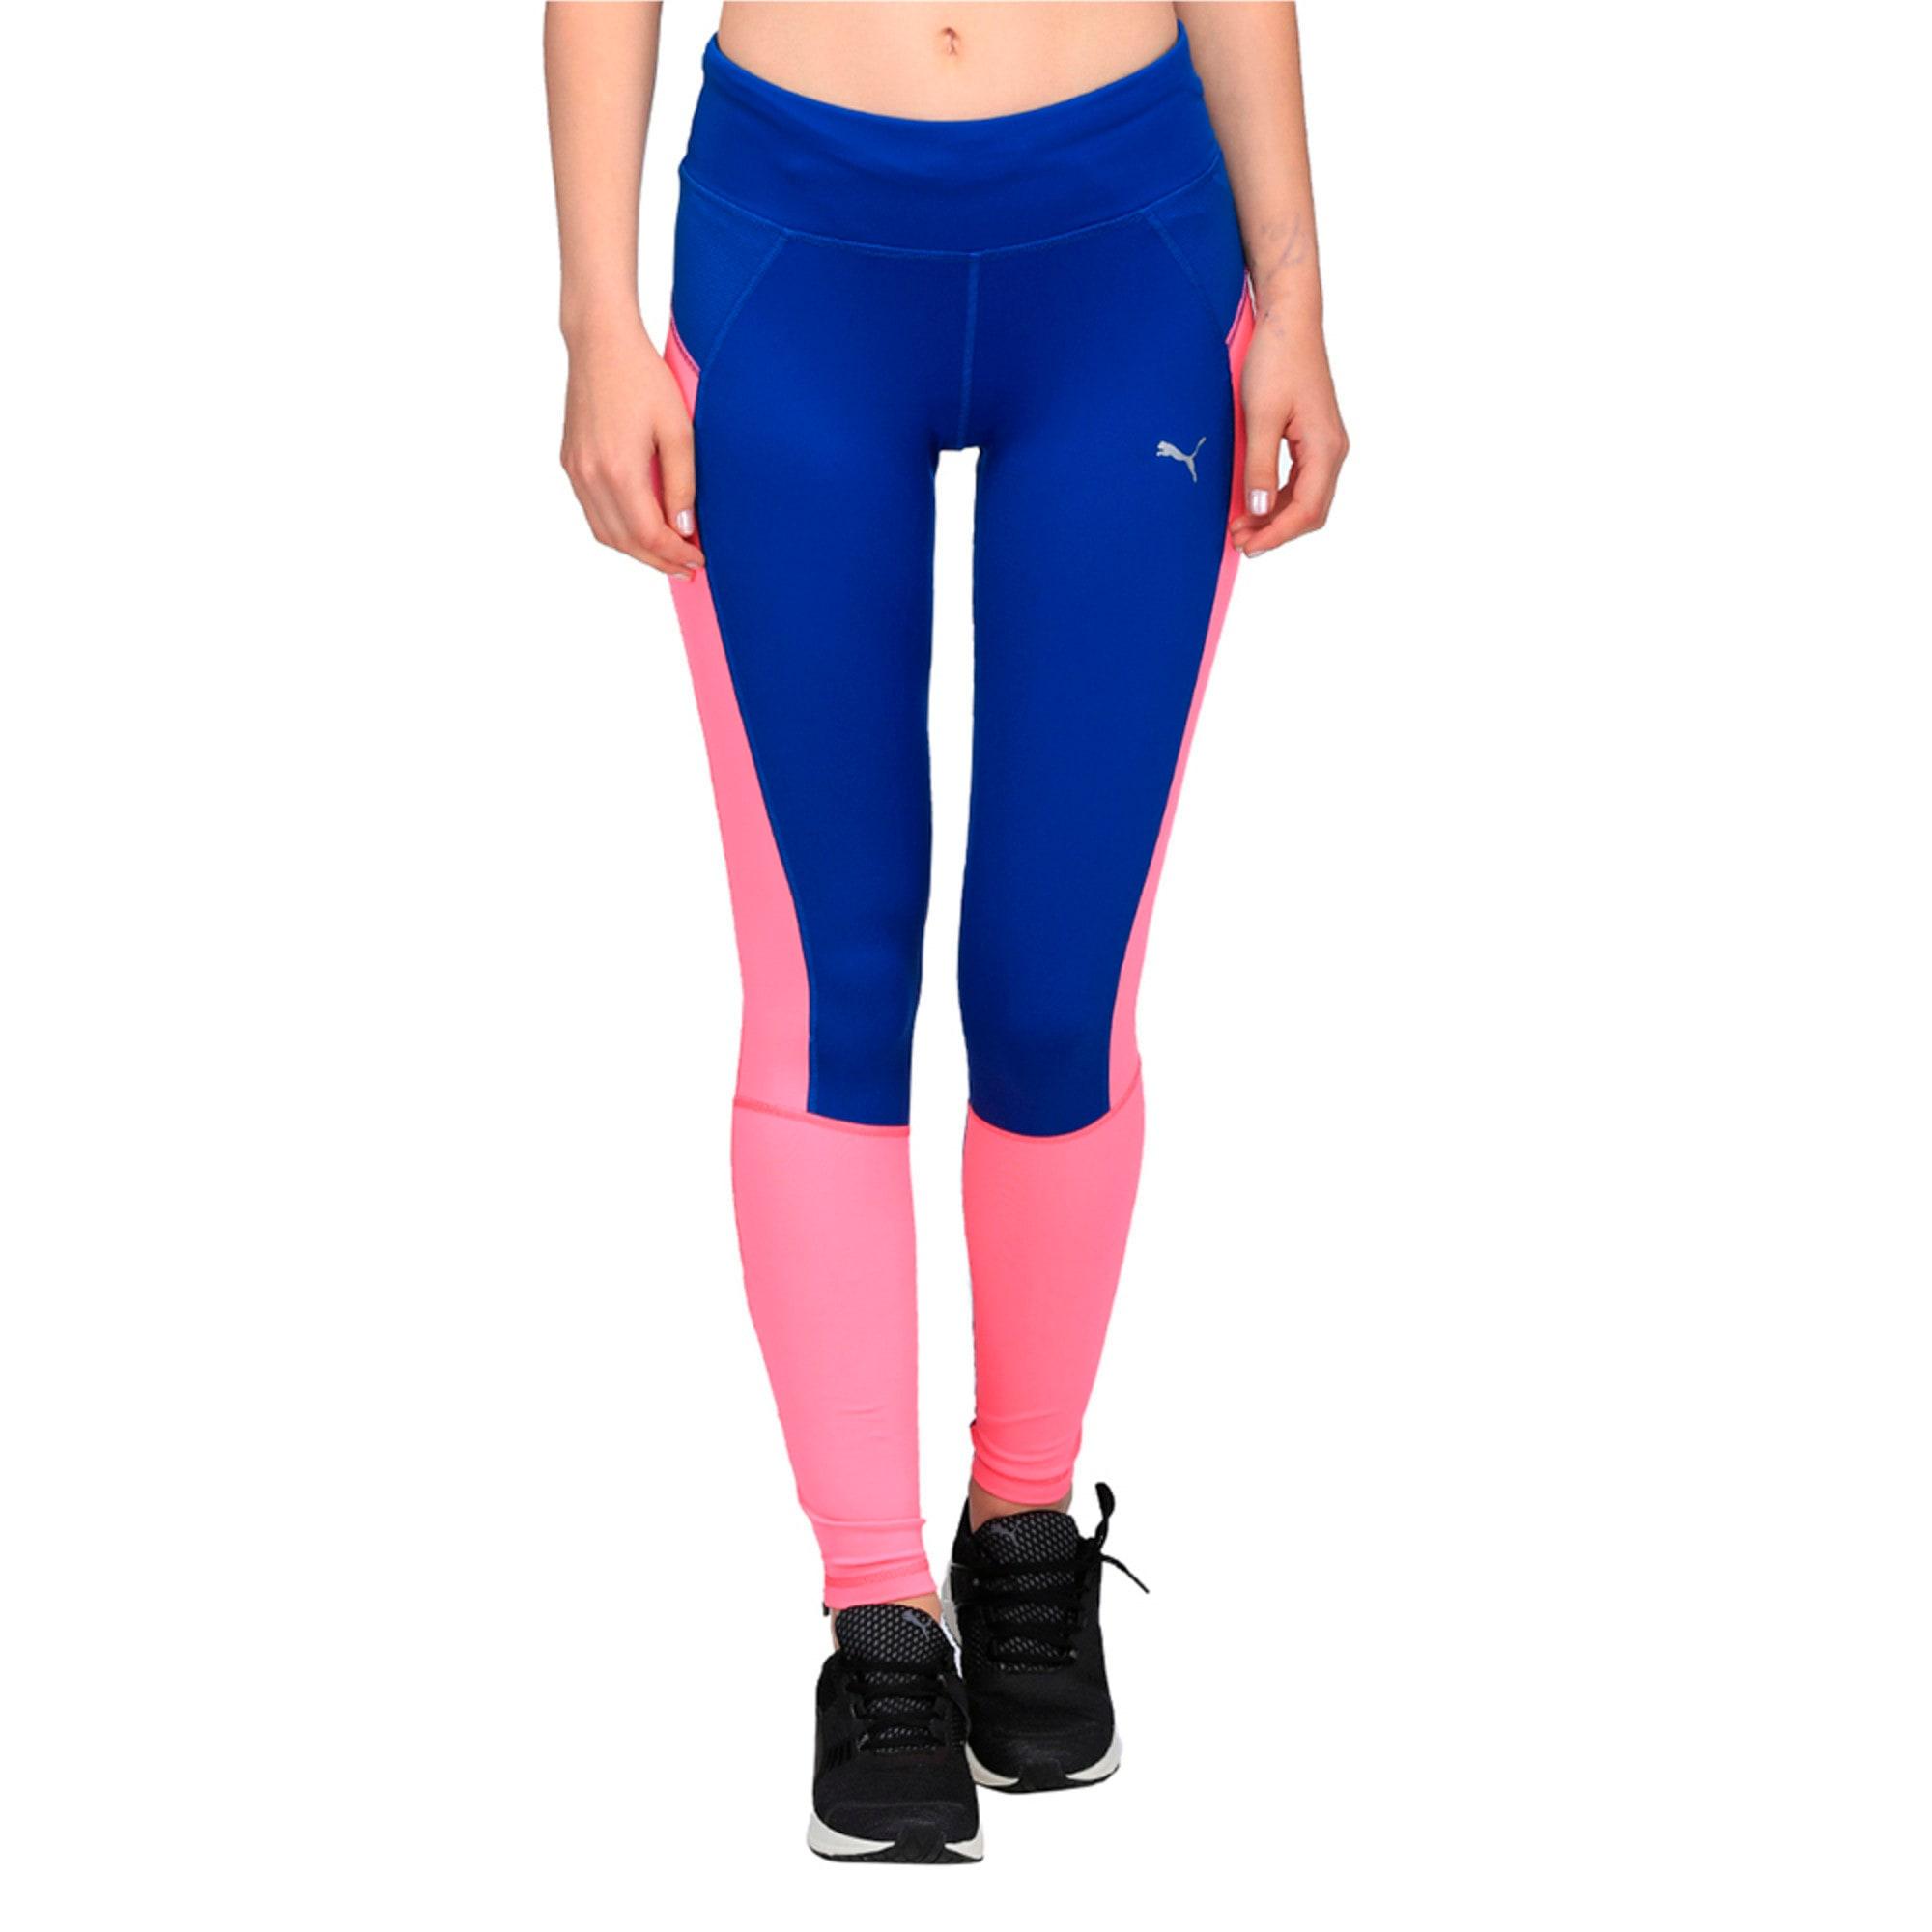 Thumbnail 1 of Running Women's Speed Tights, KNOCKOUT PINK-TRUE BLUE, medium-IND